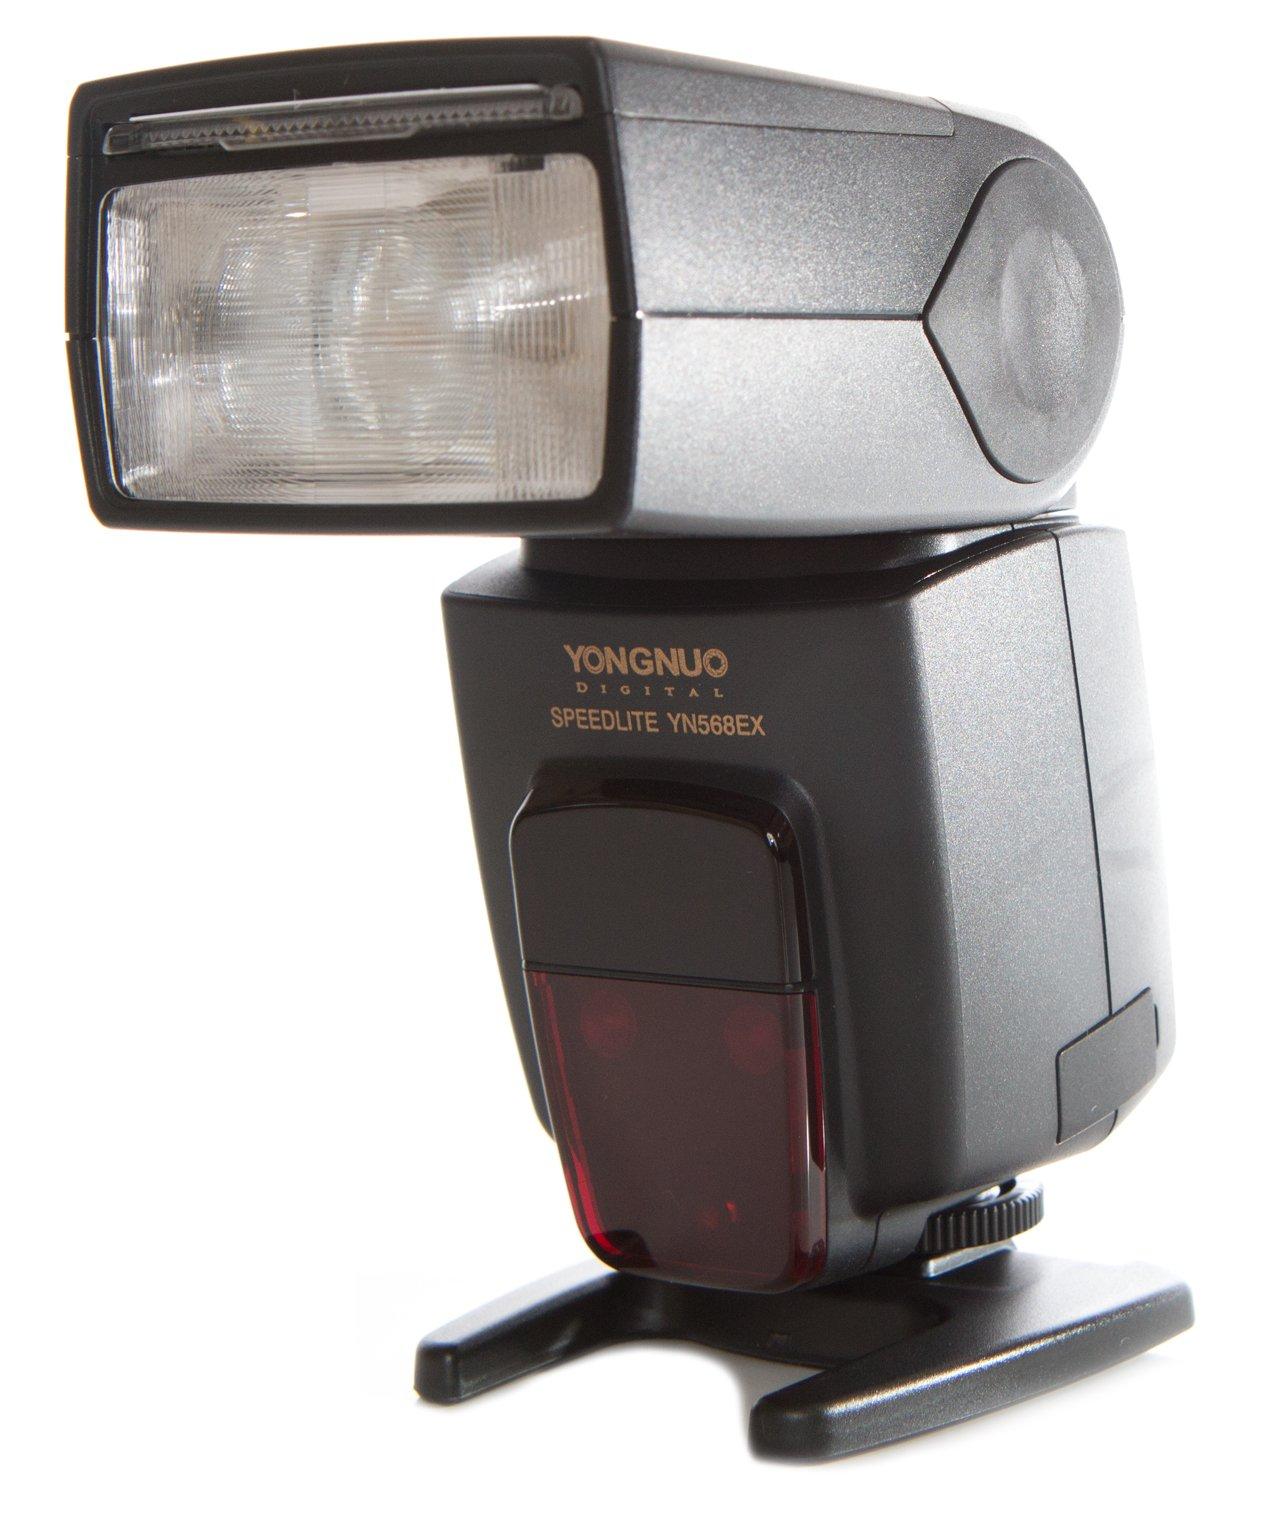 Yongnuo YN568EXN-USA i-TTL Speedlite Flash for Nikon, GN58, High-Speed Sync, US Warranty (Black) by Yongnuo